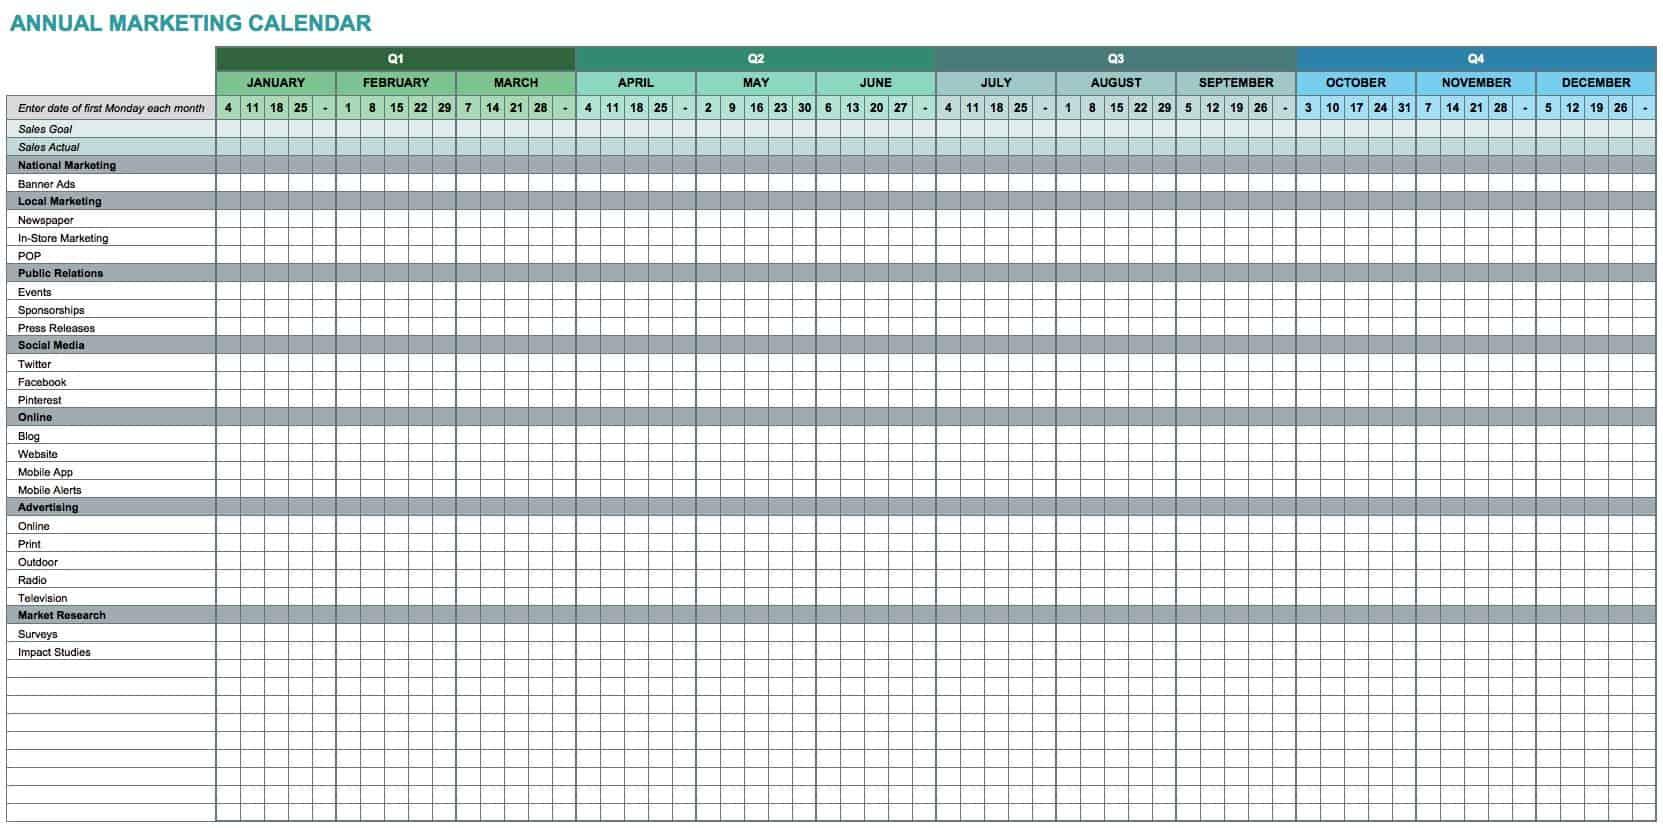 9 Modelos De Calendario De Marketing Para Excel Gratuitos